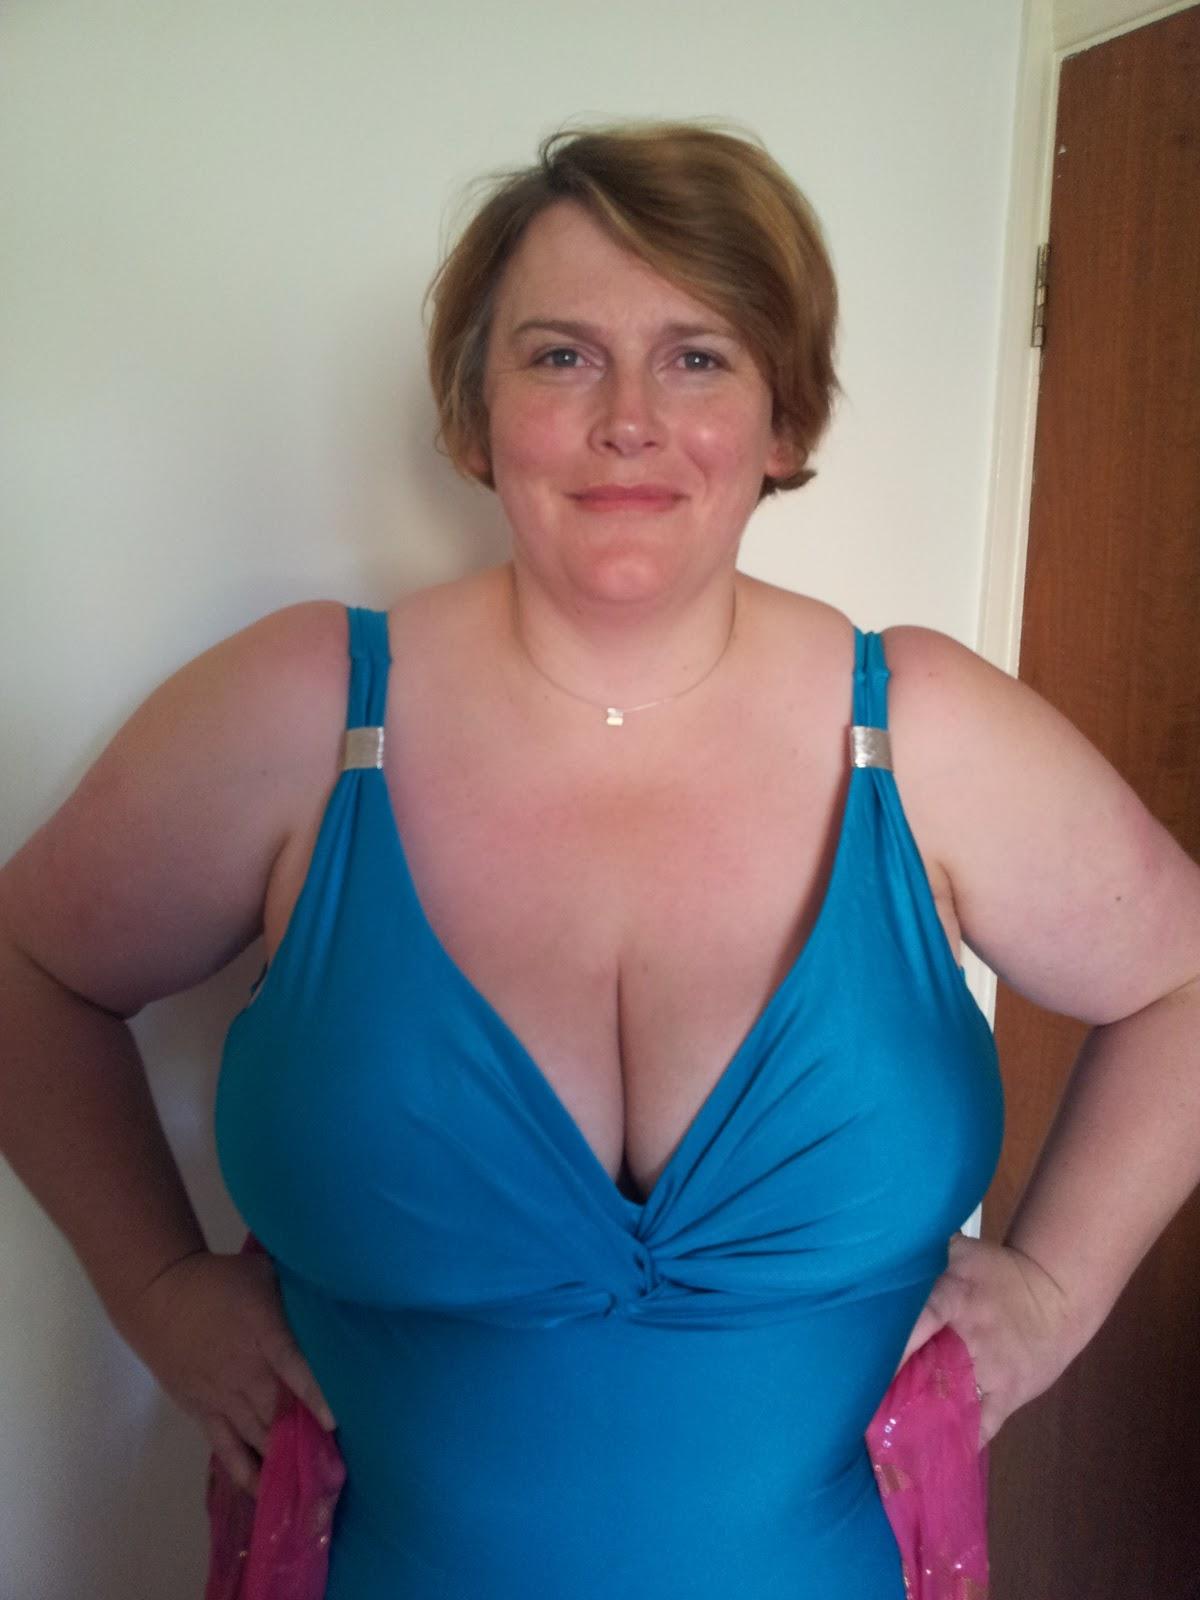 ... swimsuit from stateofmindactive com plus model mag plus model mag com